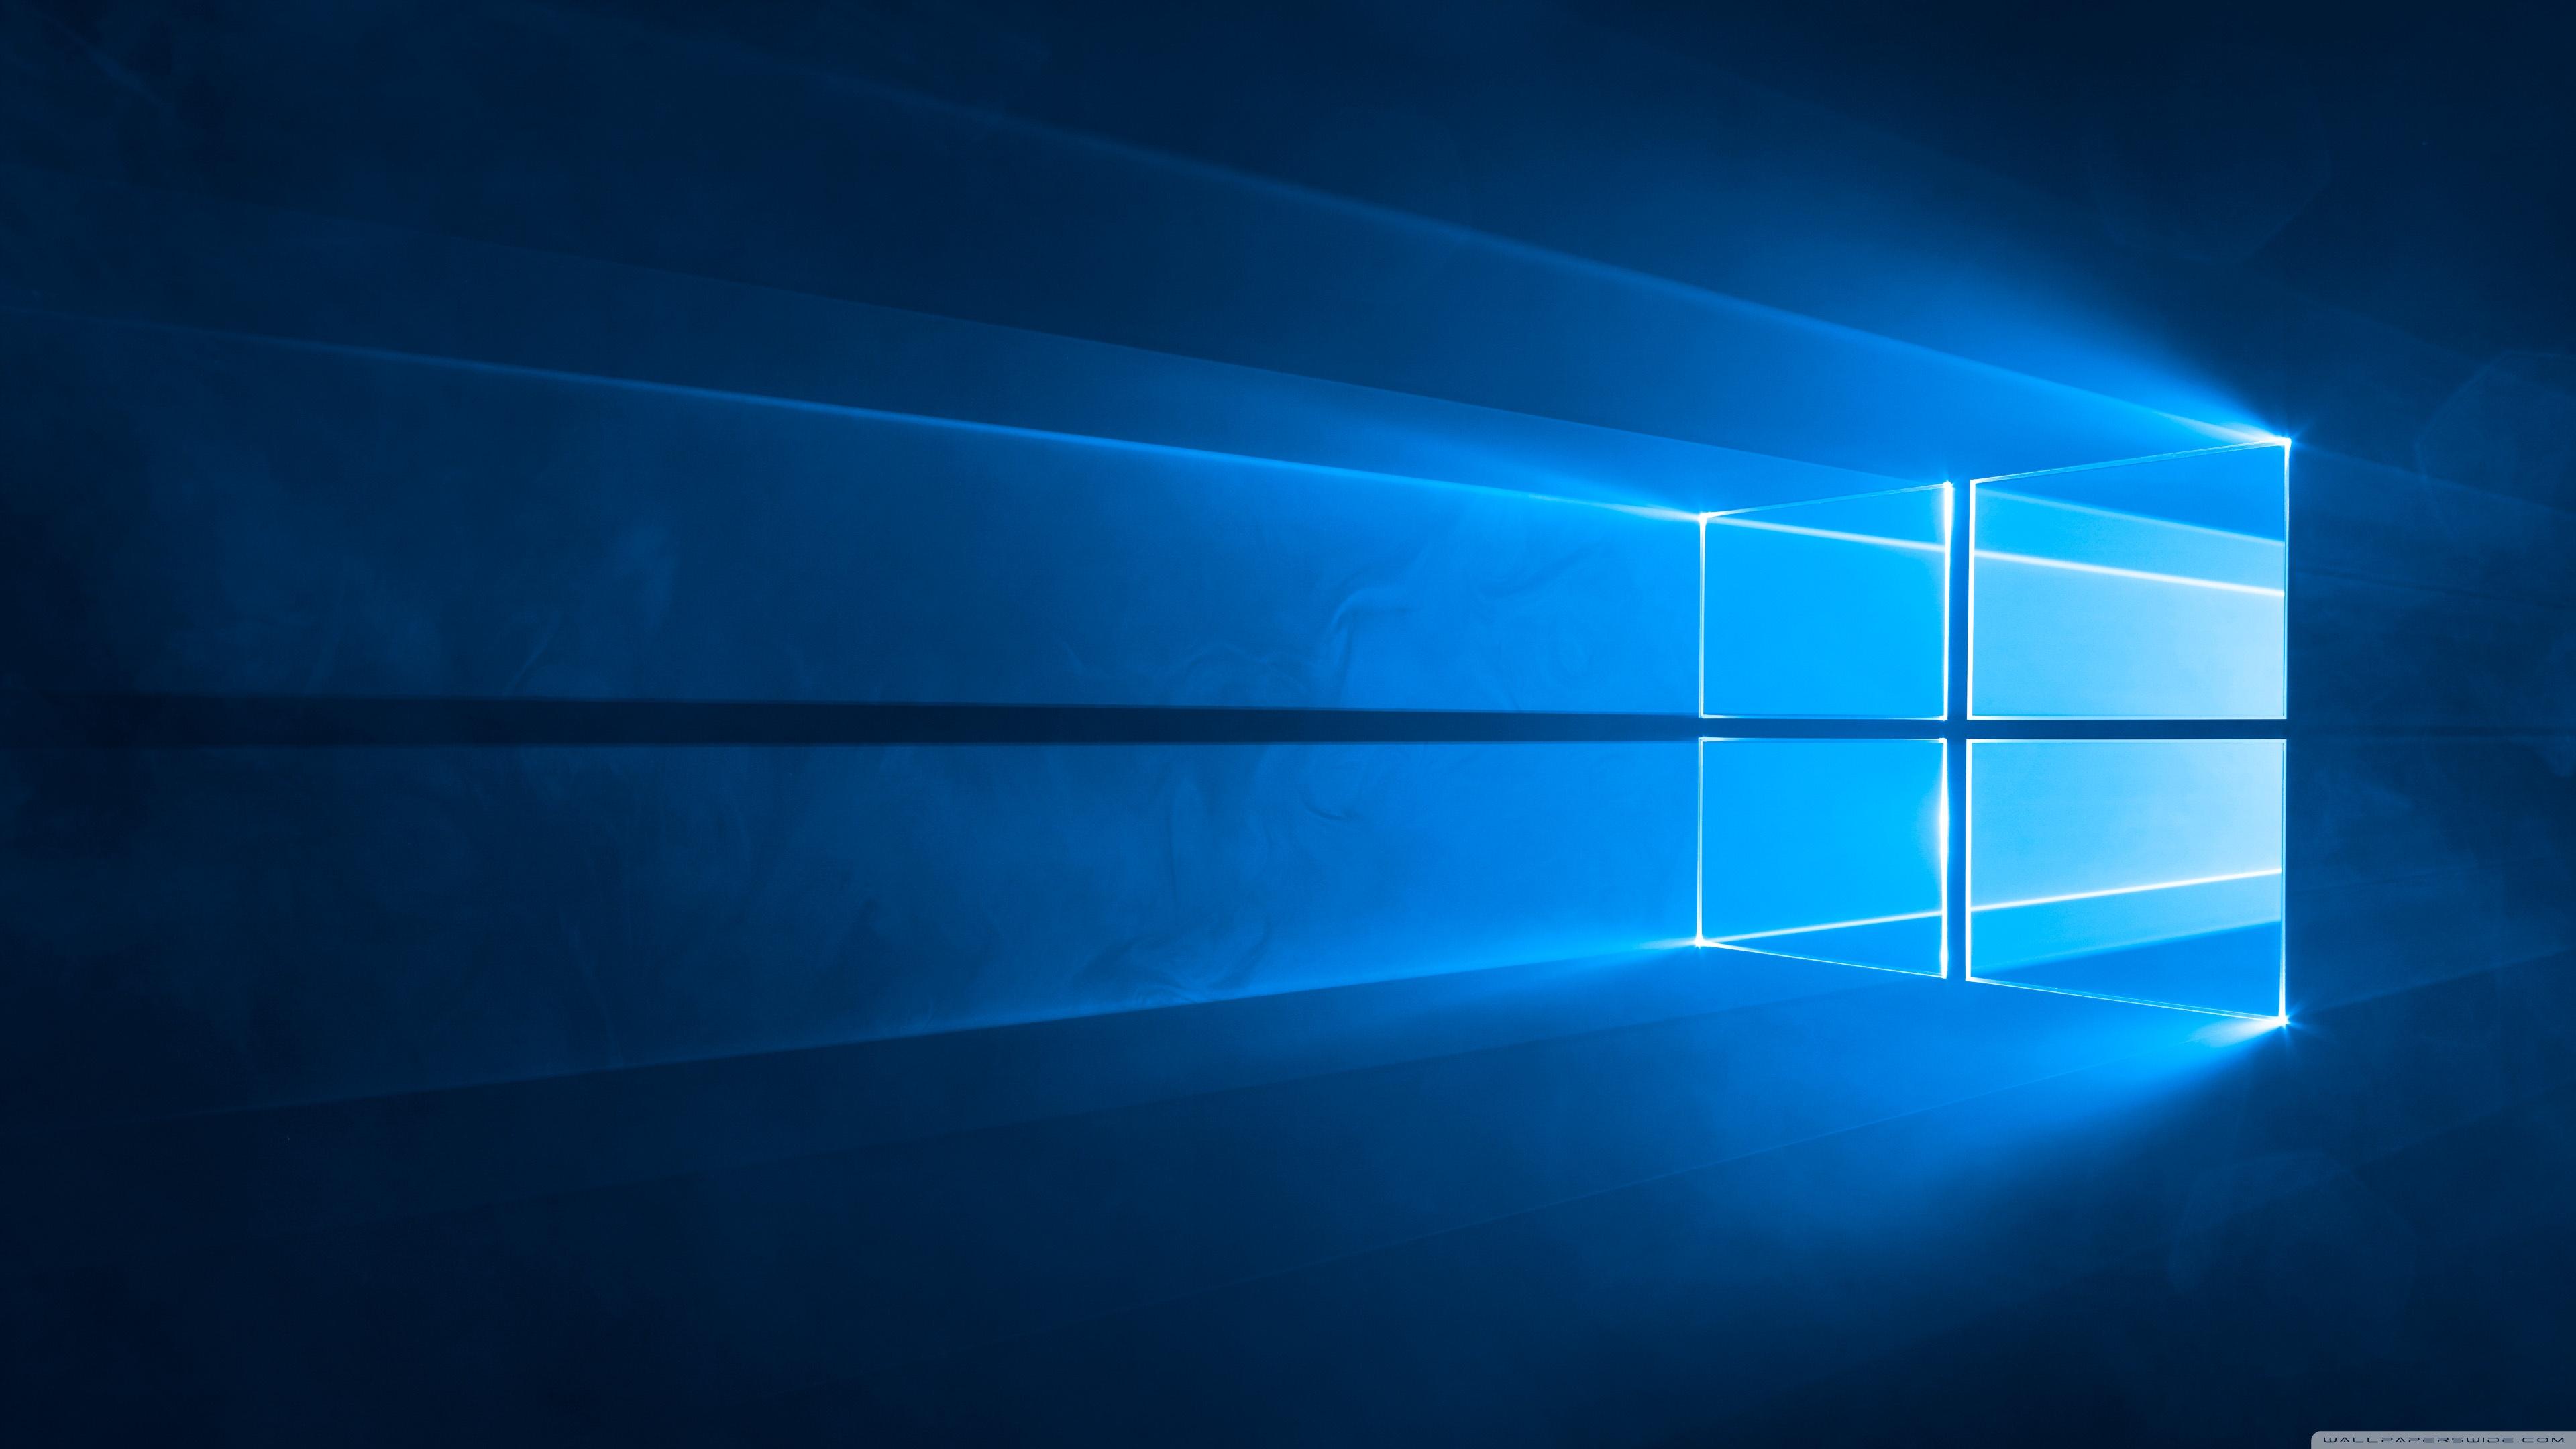 WallpapersWidecom Windows 10 HD Desktop Wallpapers for 4K 3840x2160